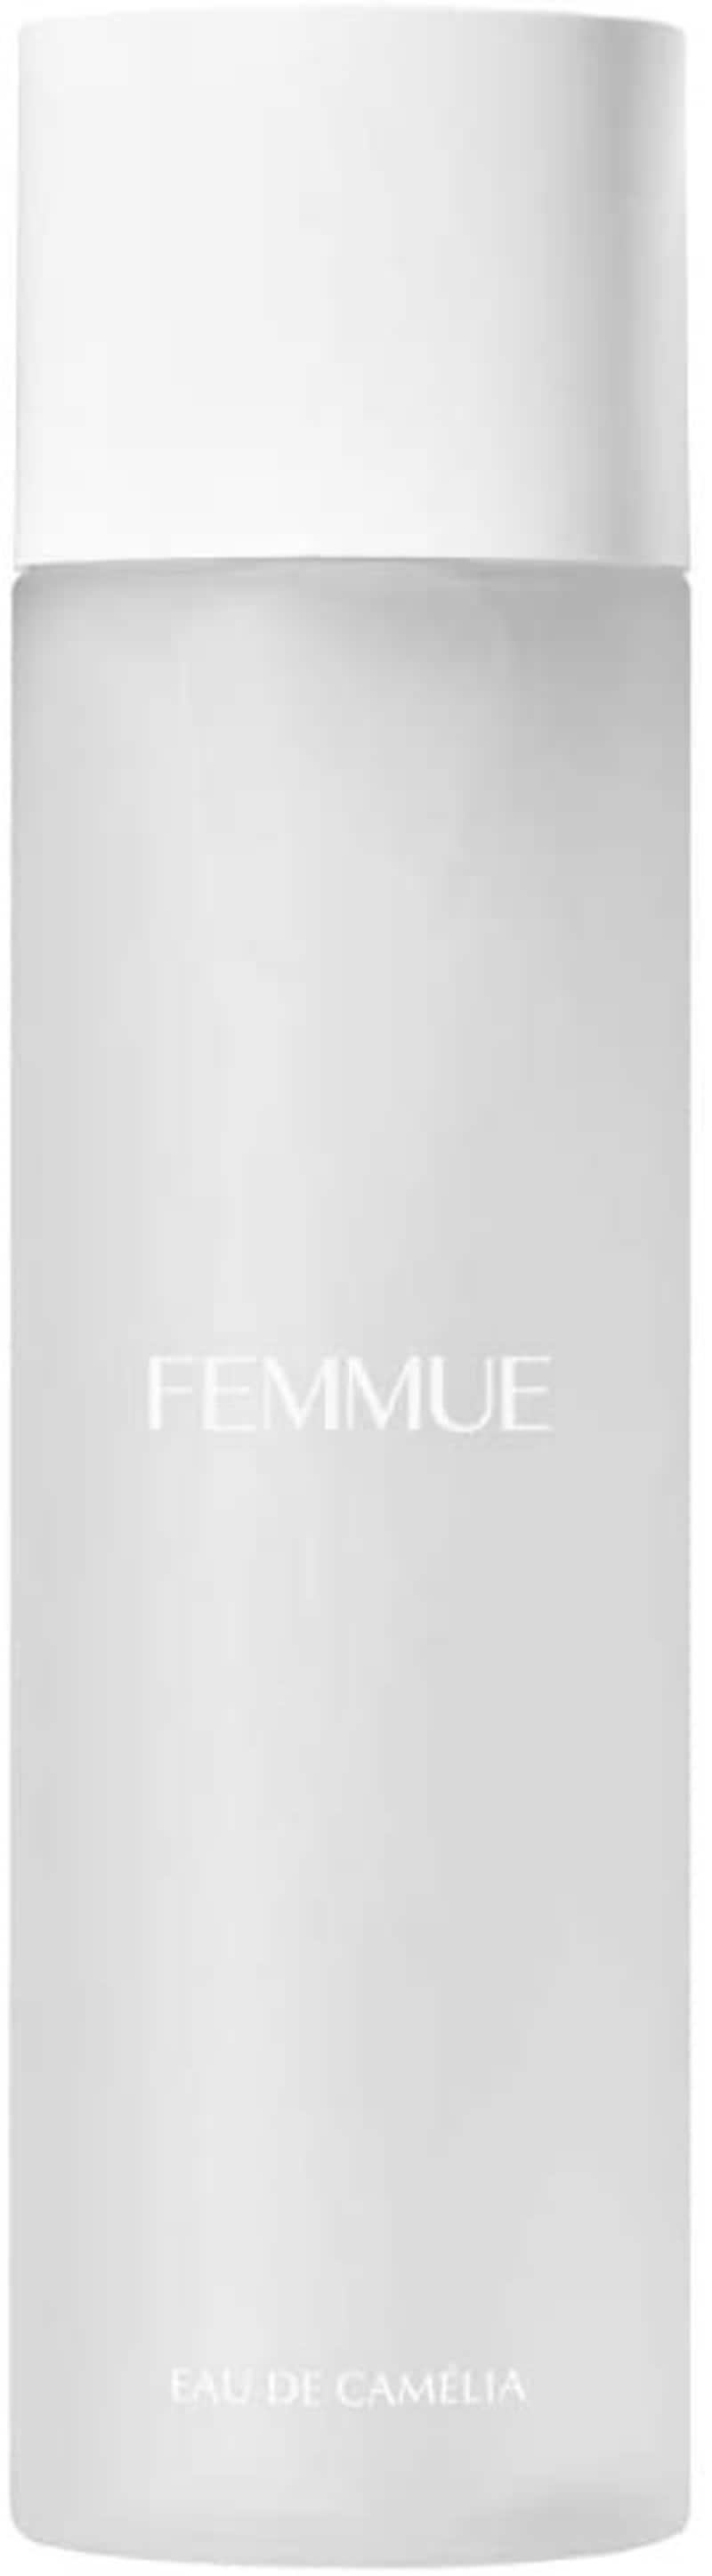 FEMMUE(ファミュ),オードカメリア 化粧水